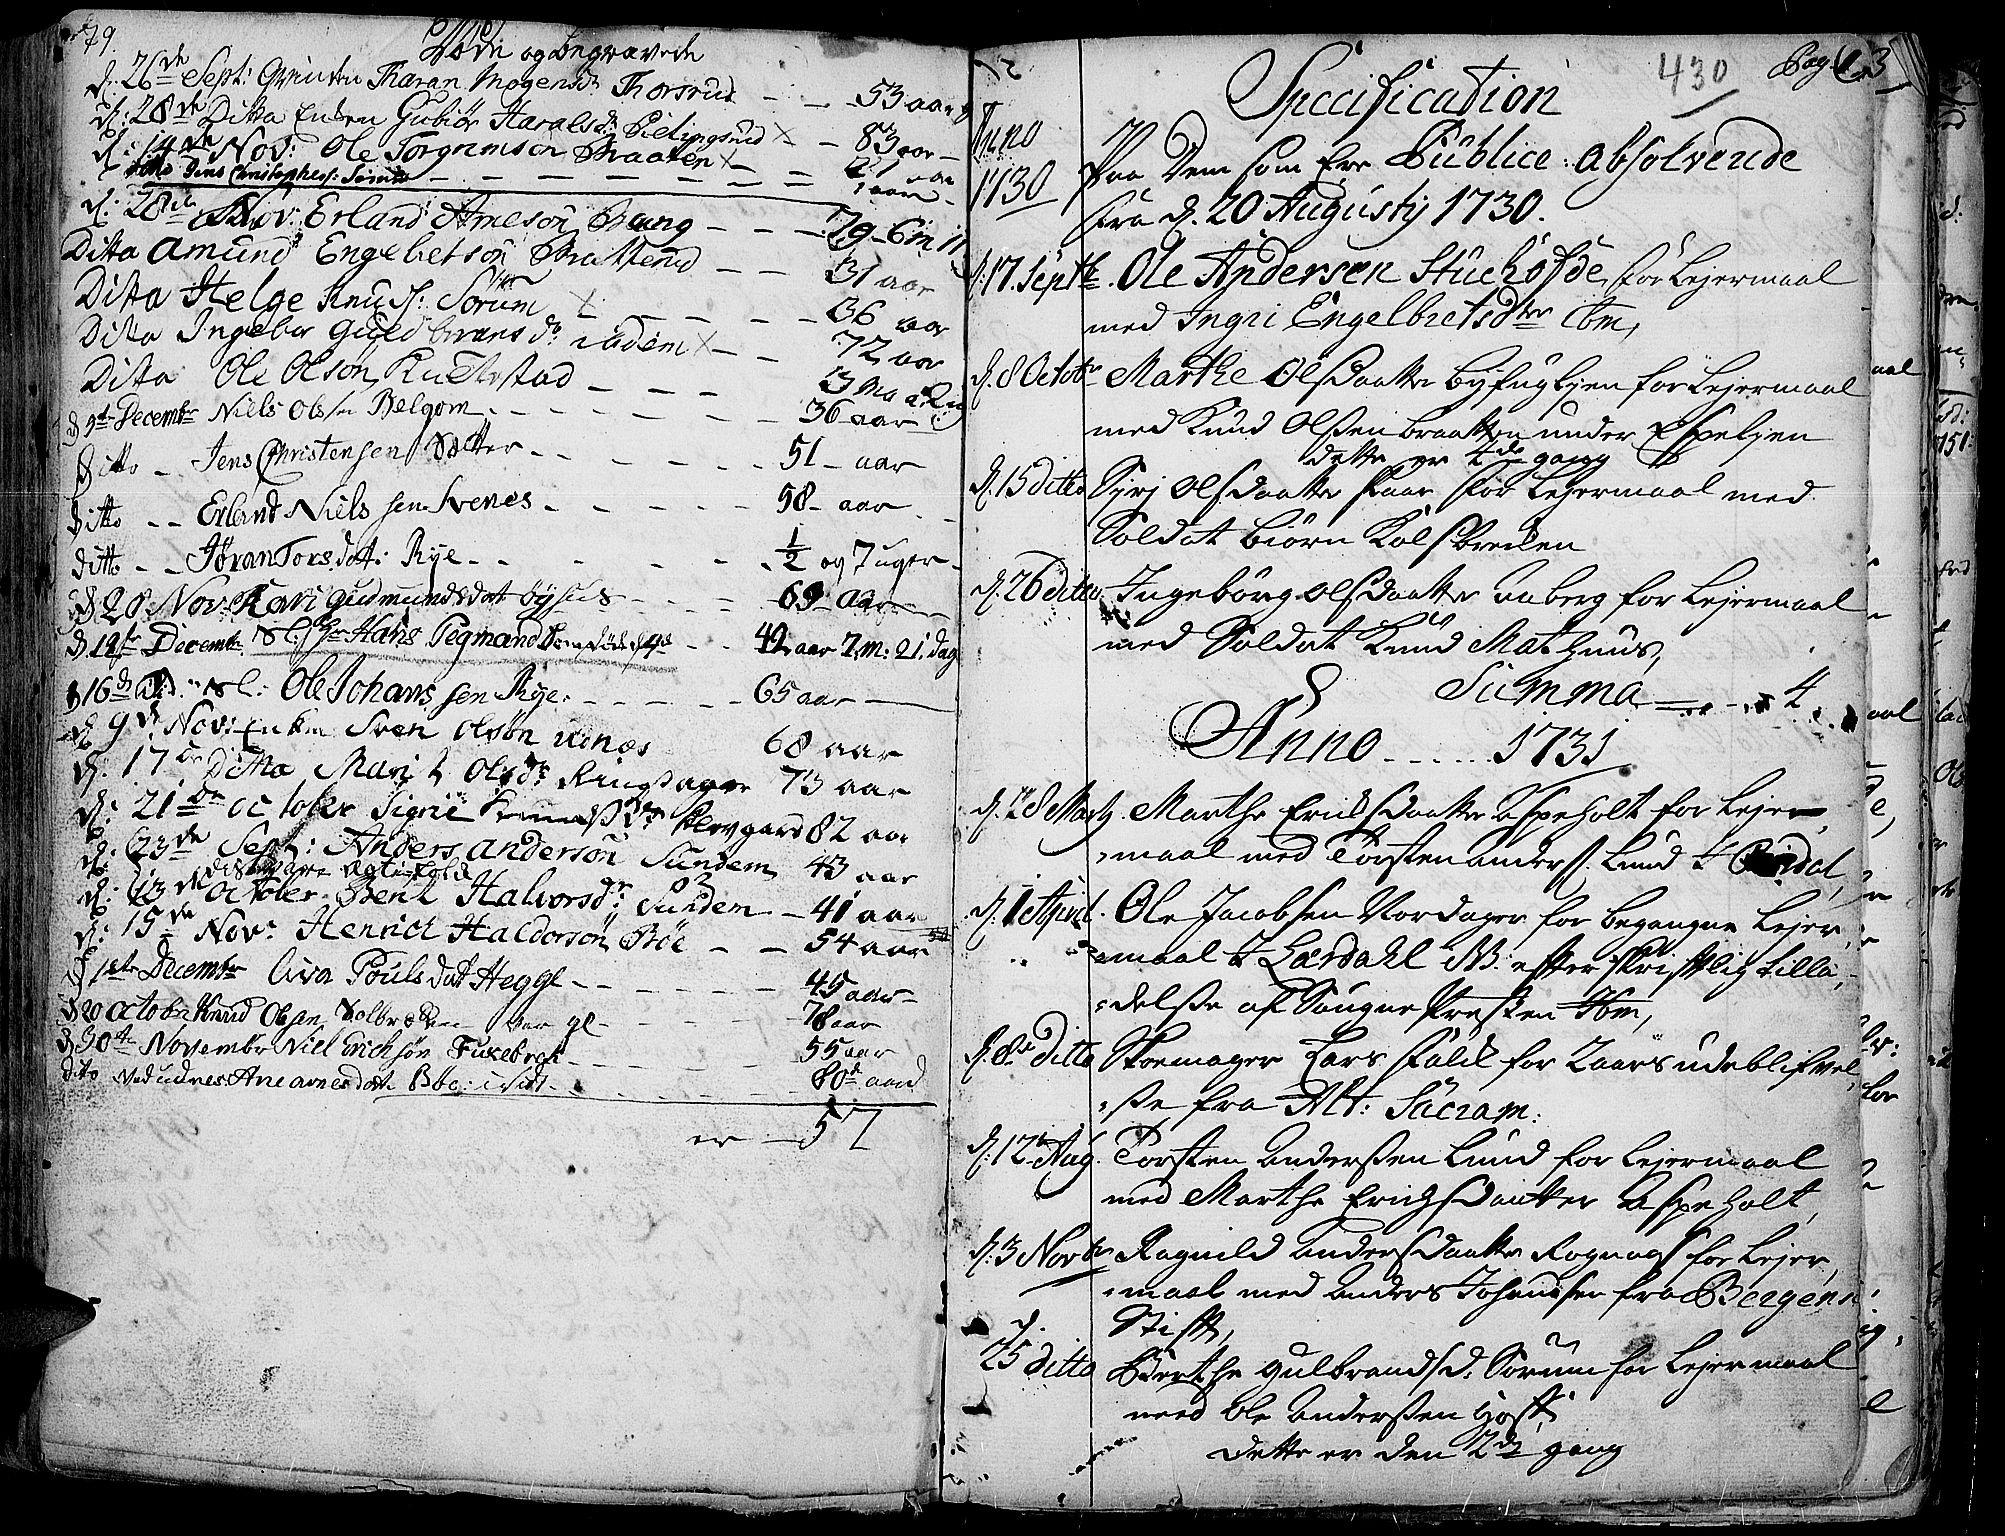 SAH, Aurdal prestekontor, Ministerialbok nr. 4, 1730-1762, s. 79-1